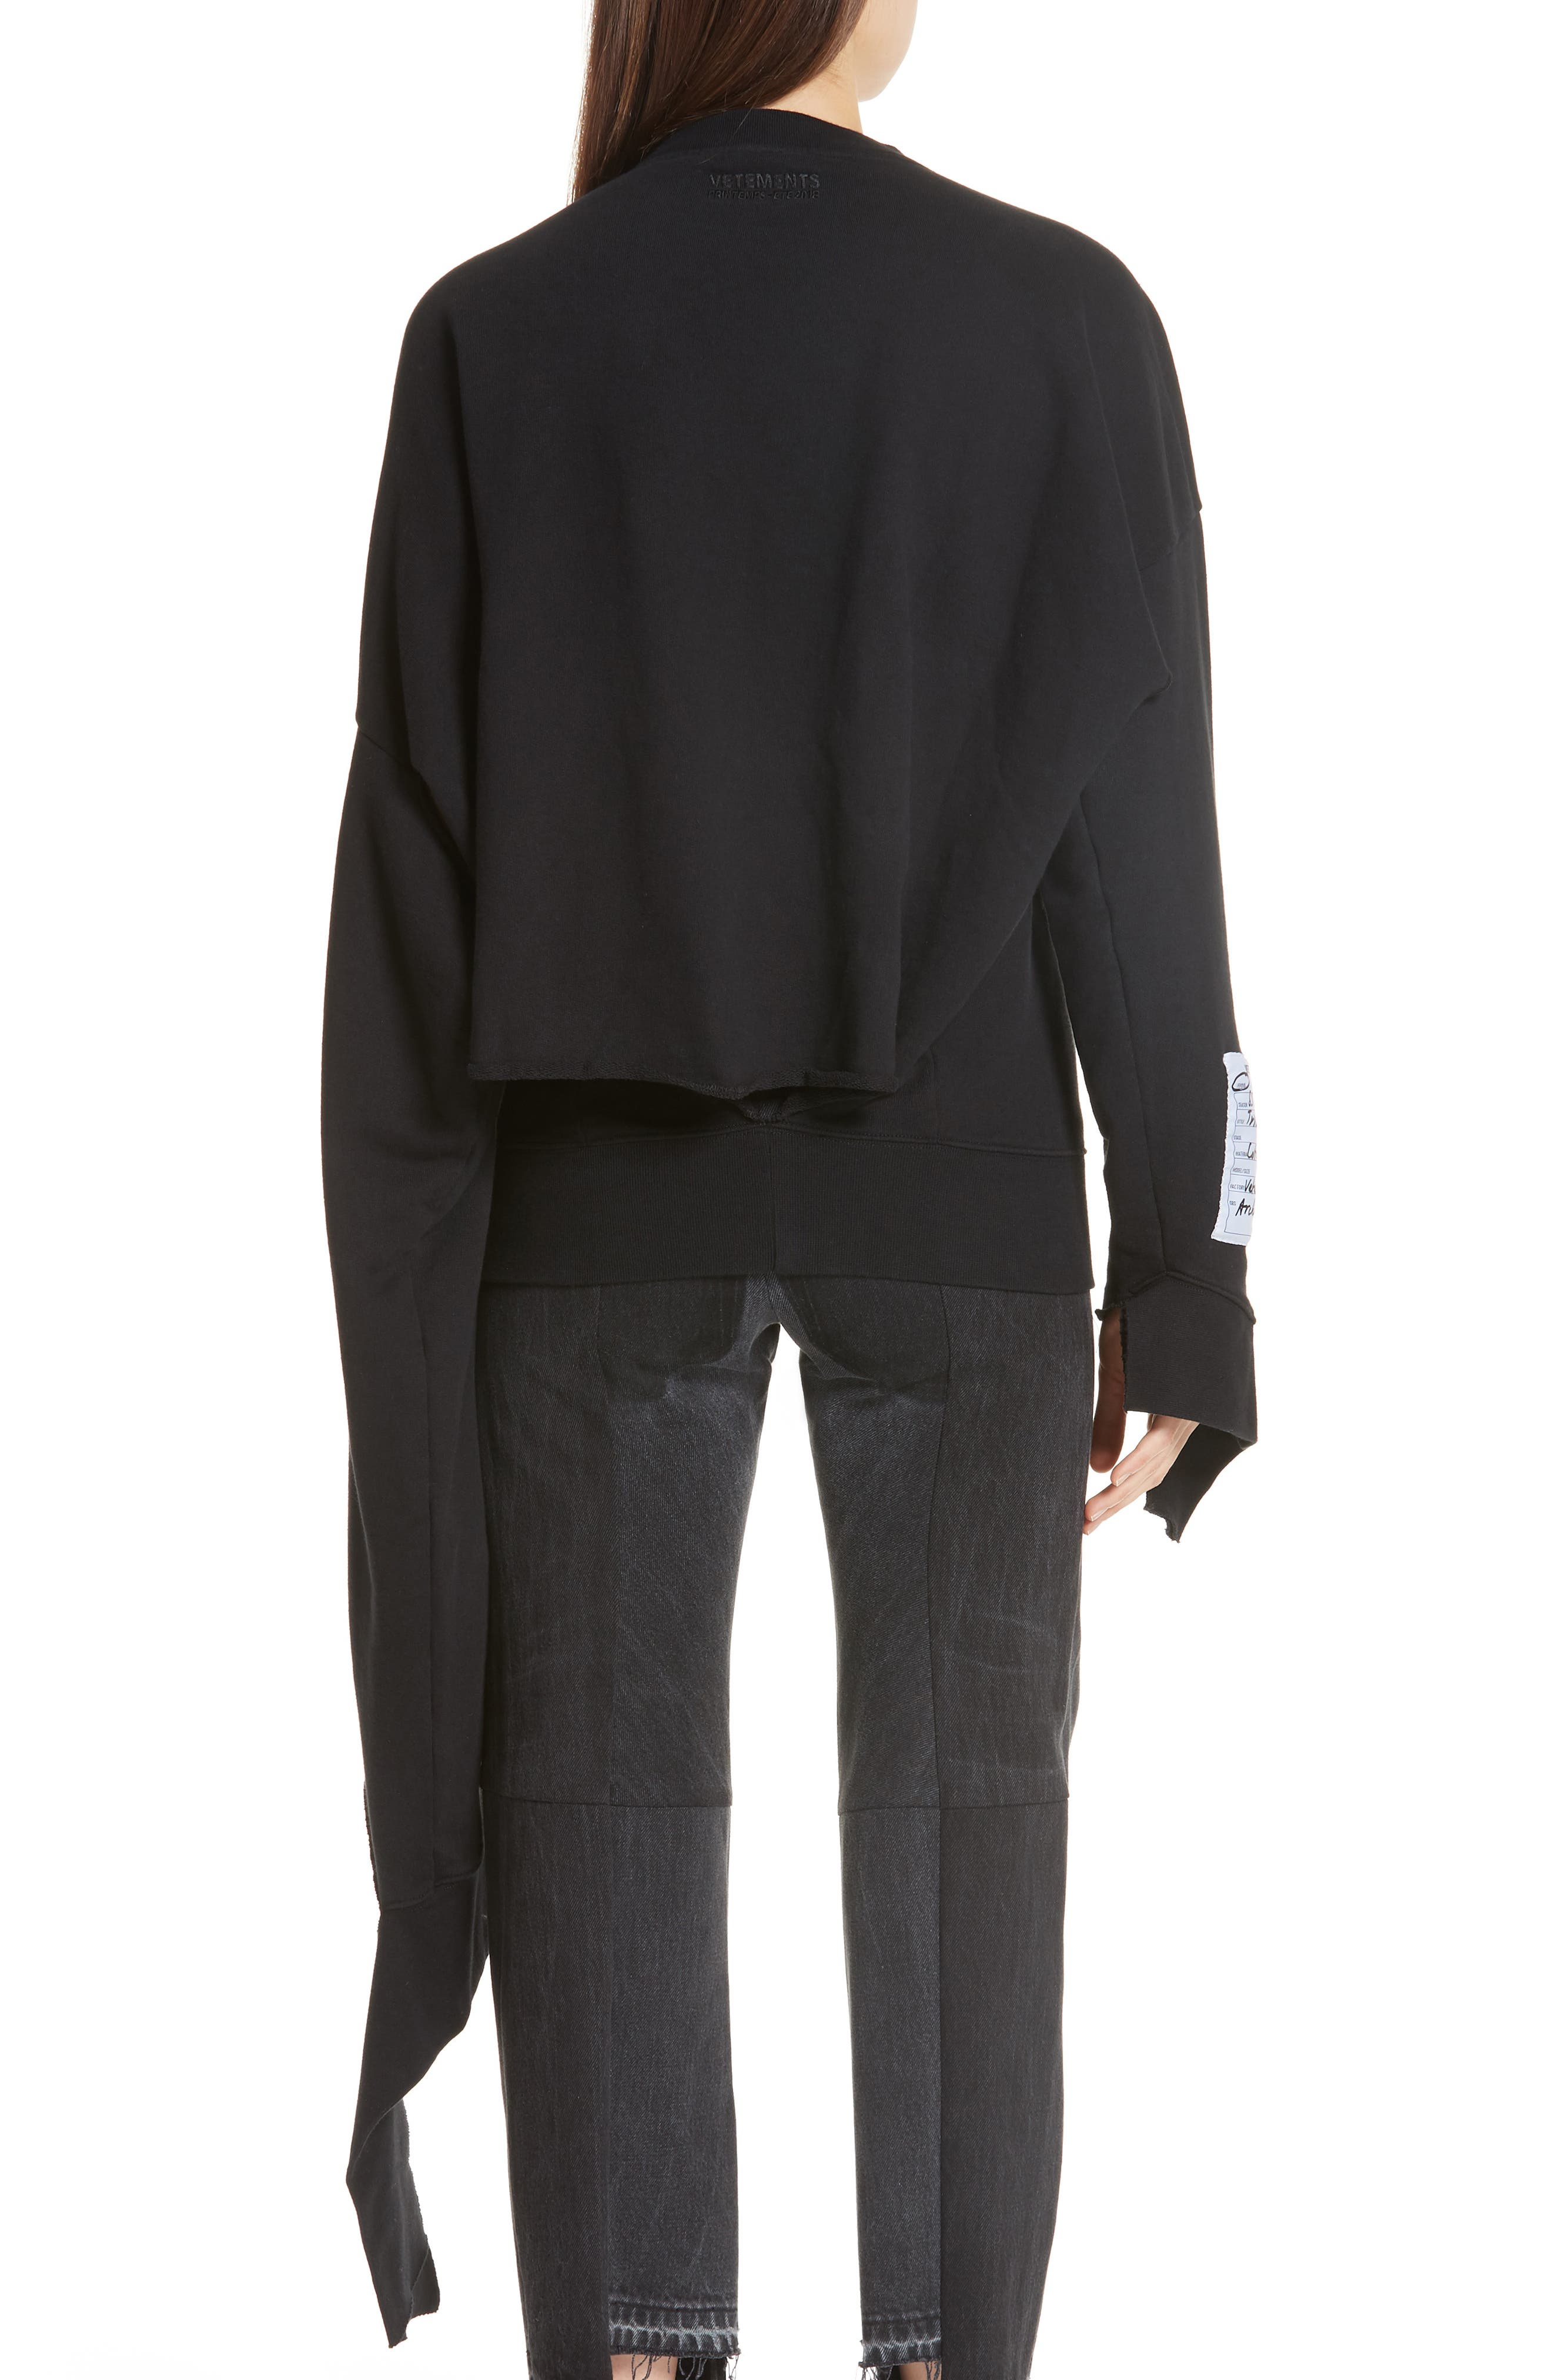 In Progress Crewneck Sweatshirt,                             Alternate thumbnail 2, color,                             Black